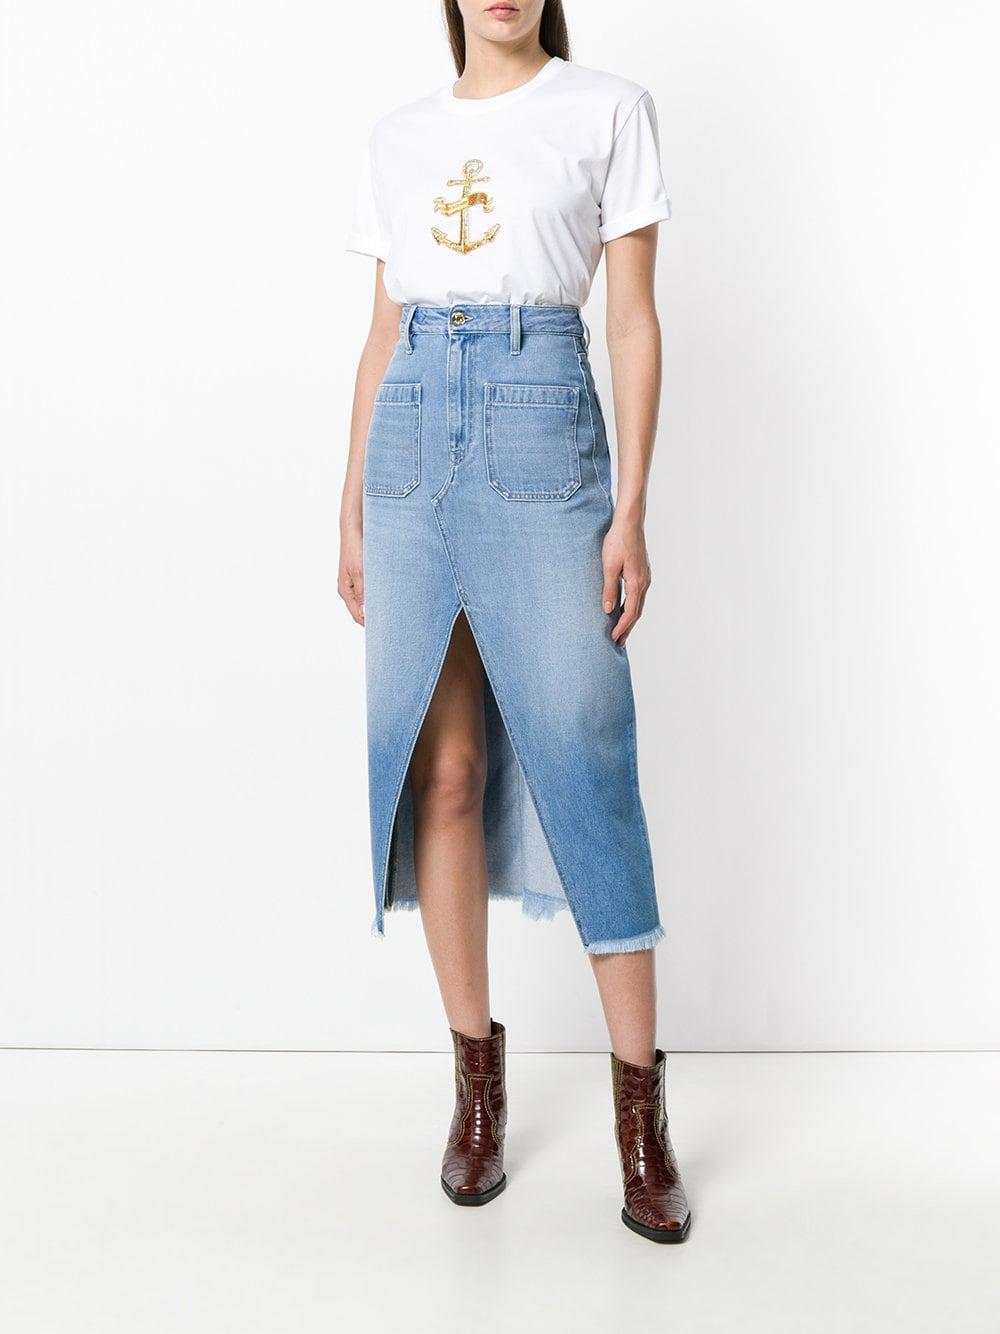 Jupe mi-longue en jean Jean The Seafarer en coloris Bleu